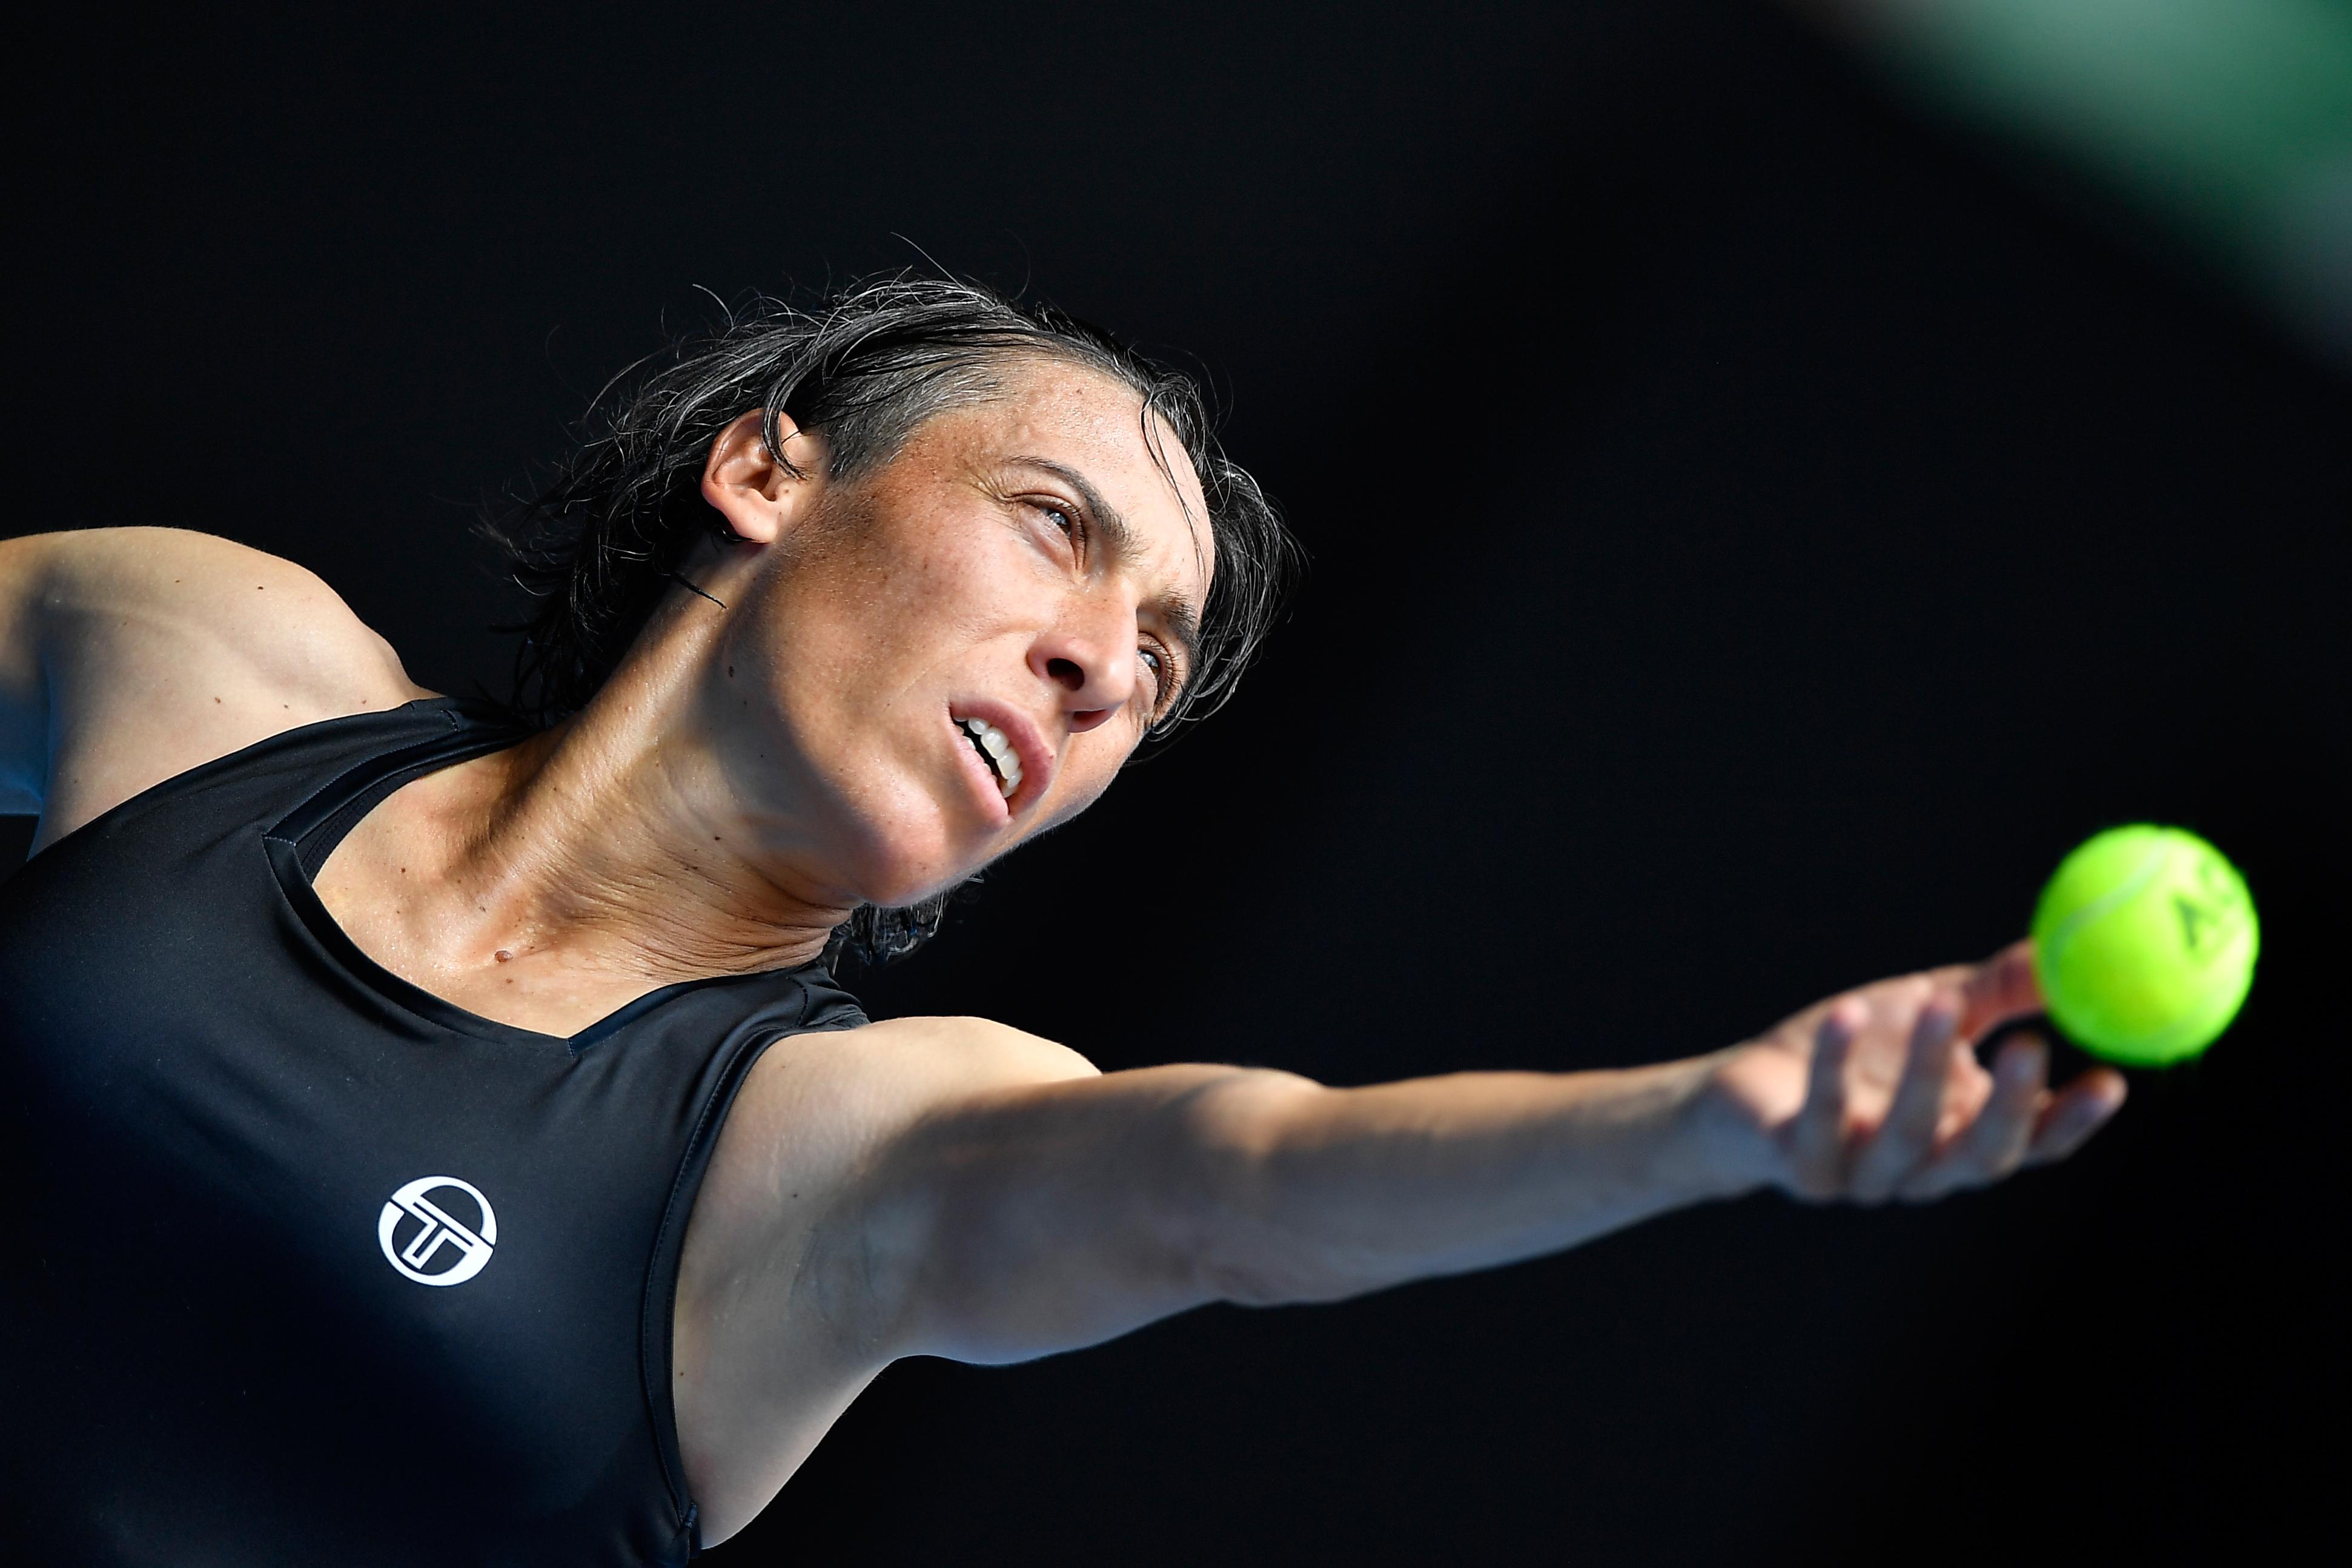 """A batalha foi dura mas continuo a respirar"". Ex-tenista Francesca Schiavone revela ter vencido o cancro"